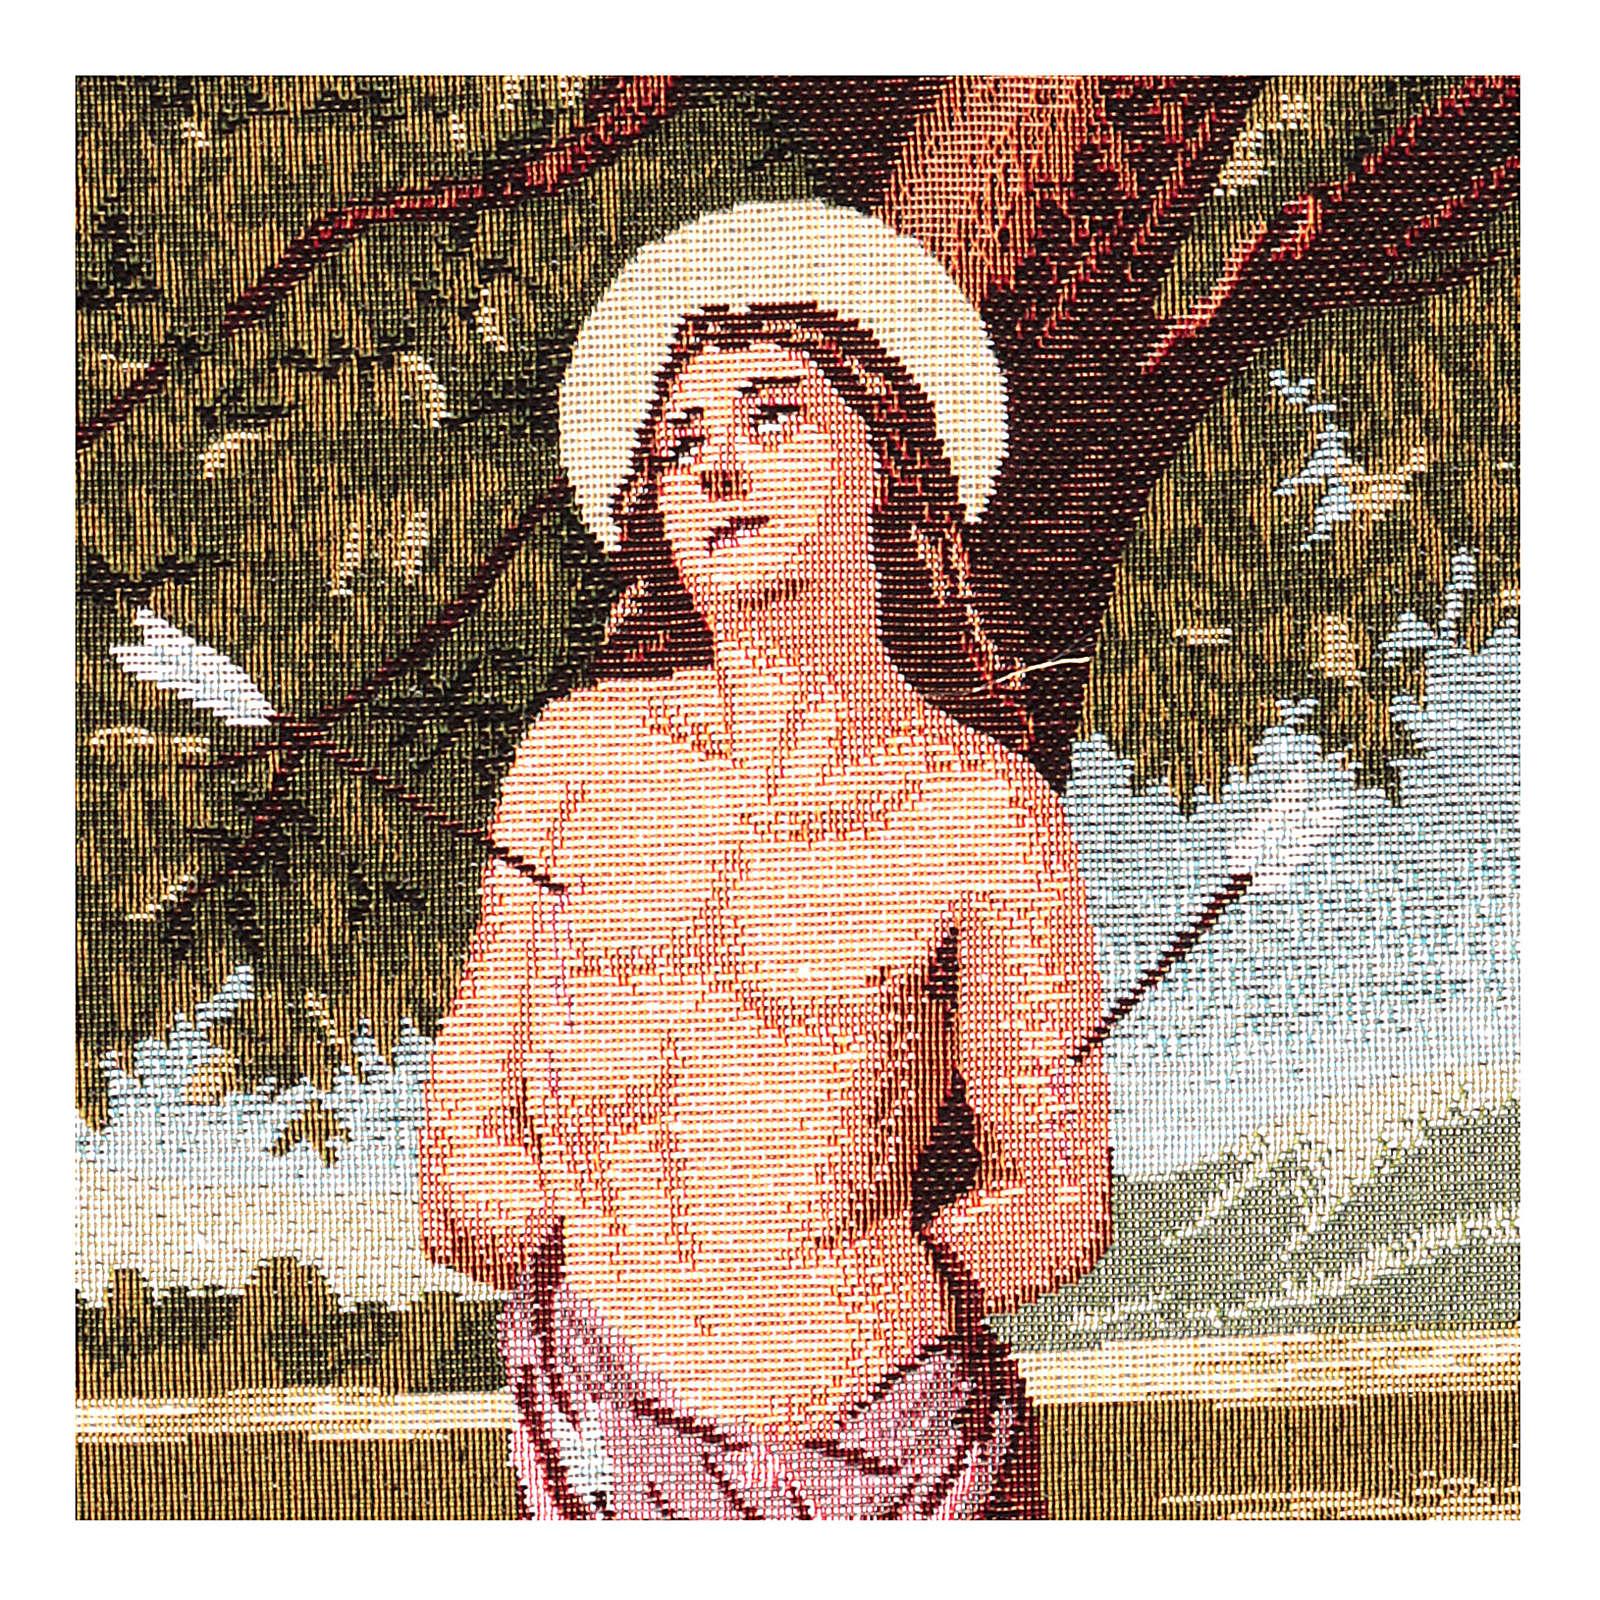 Saint Sebastian tapestry 12x17.7